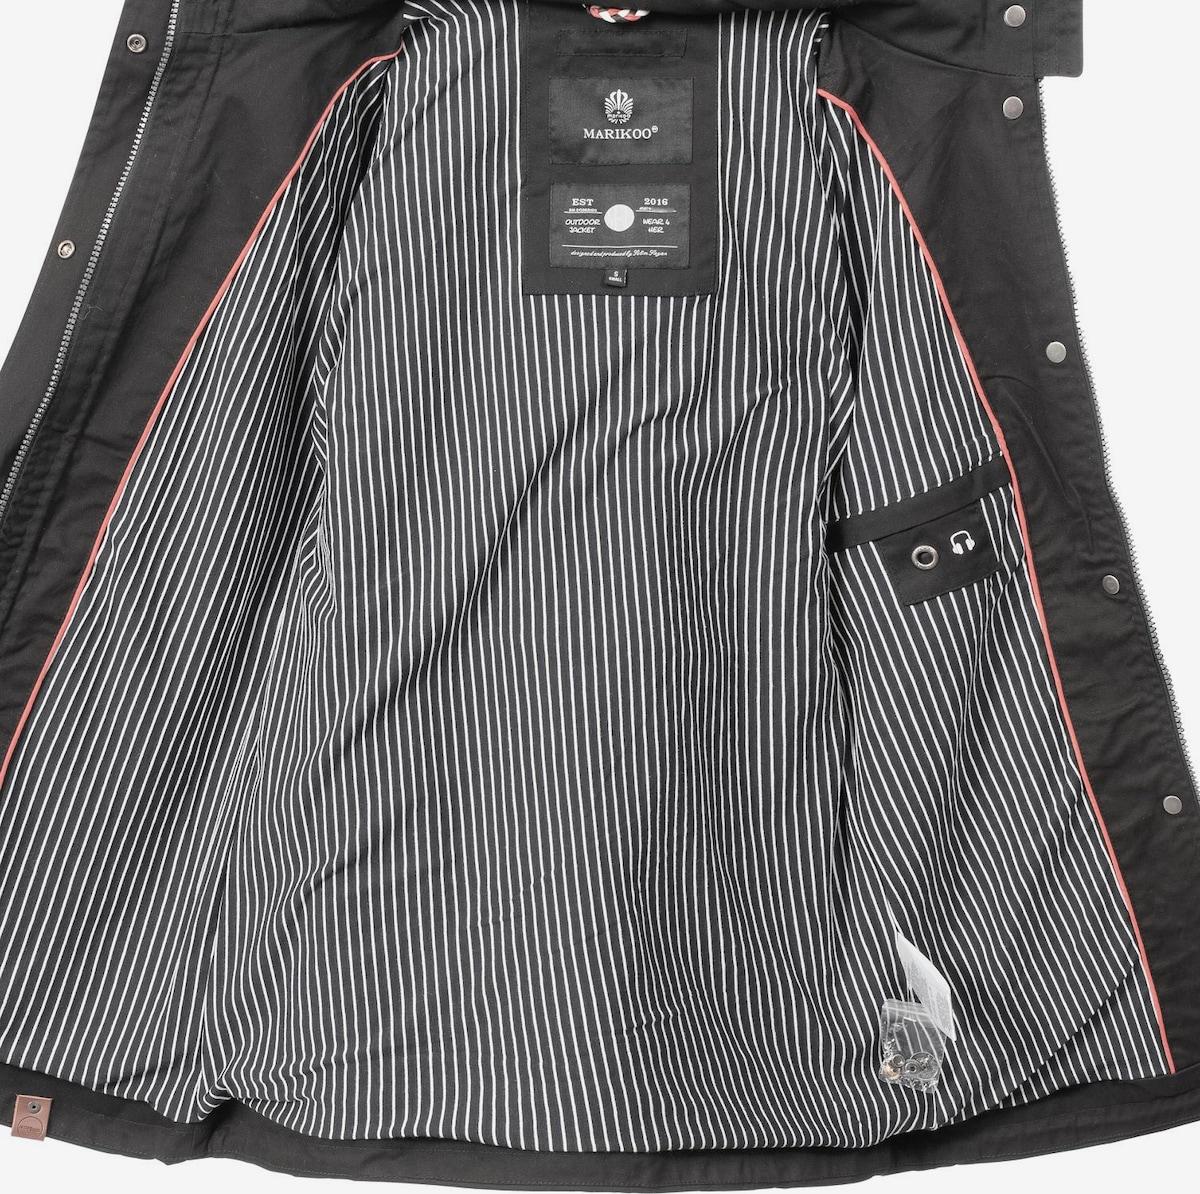 Beliebt Frauen Bekleidung MARIKOO Outdoorjacke 'Nyokoo' in schwarz Zum Verkauf